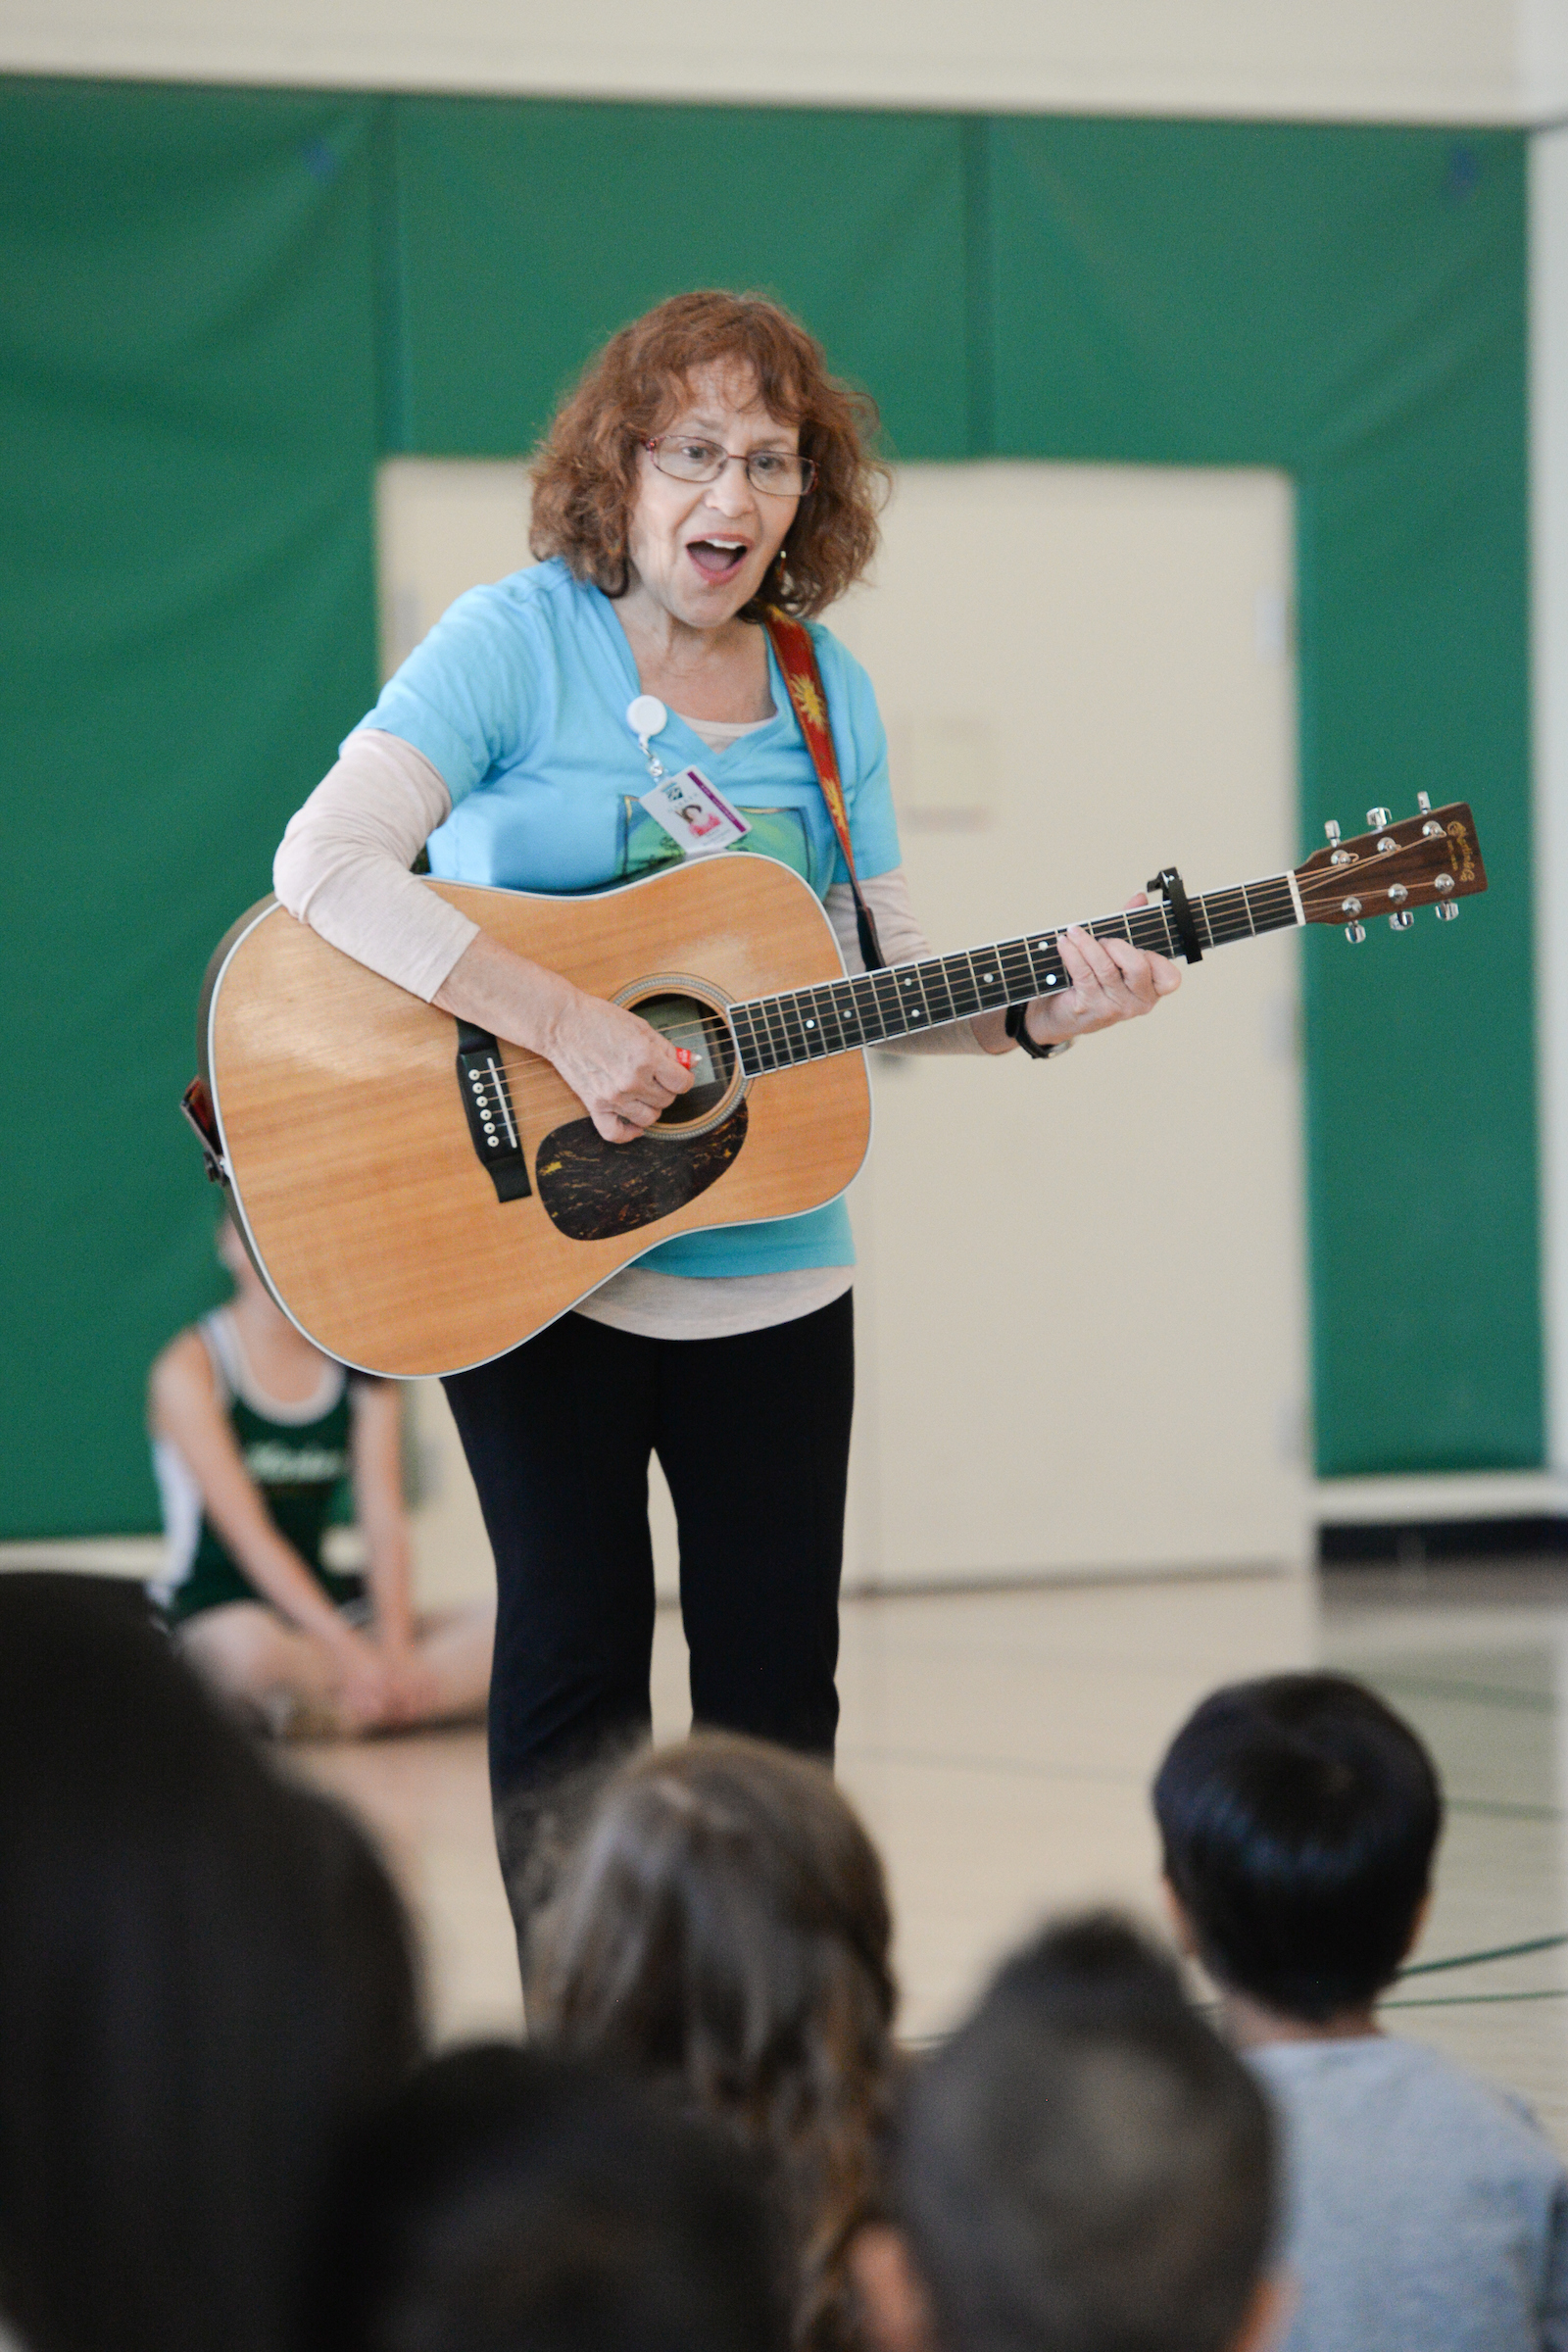 Mara Beckerman, Photo credit: The Harker School